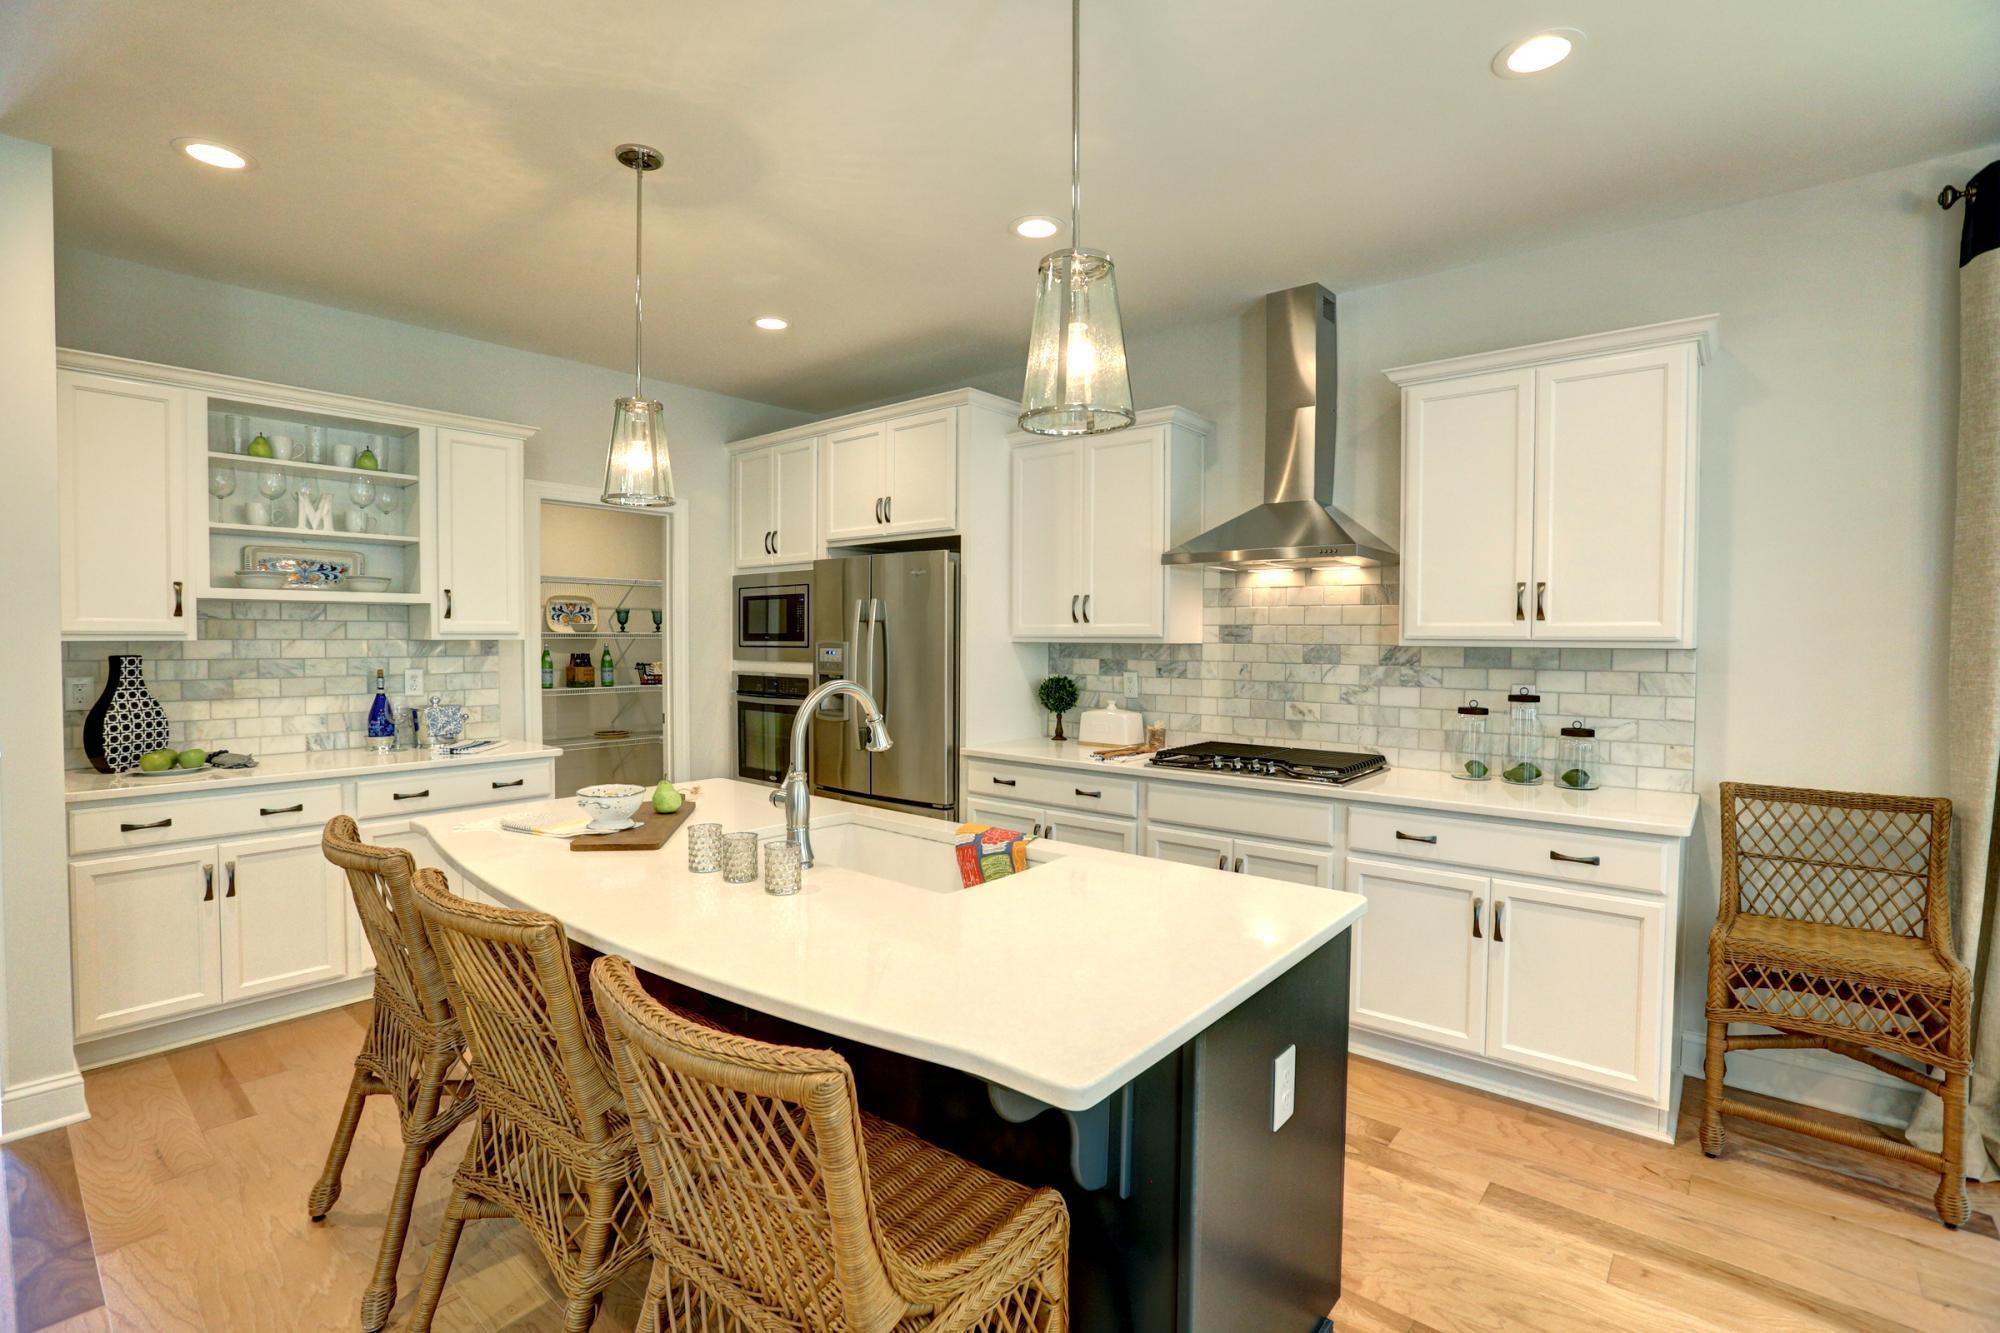 Kitchen featured in the Monterey By Main Street Homes in Richmond-Petersburg, VA